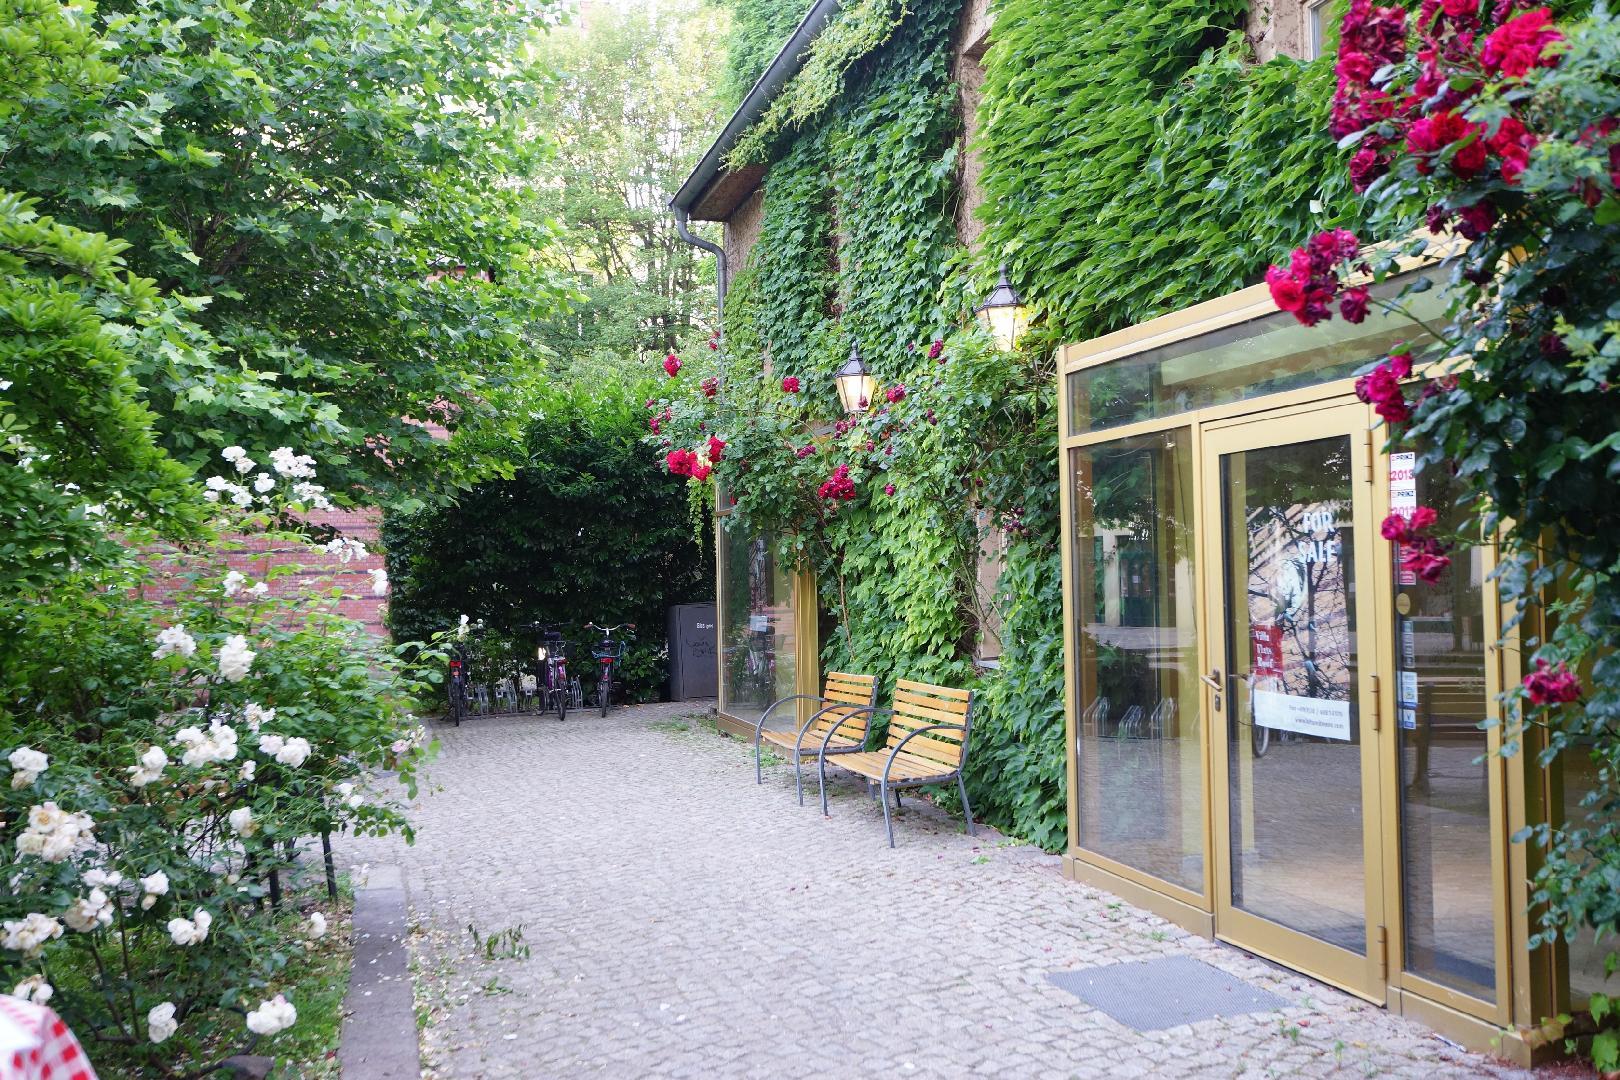 Werkhaus during daytime